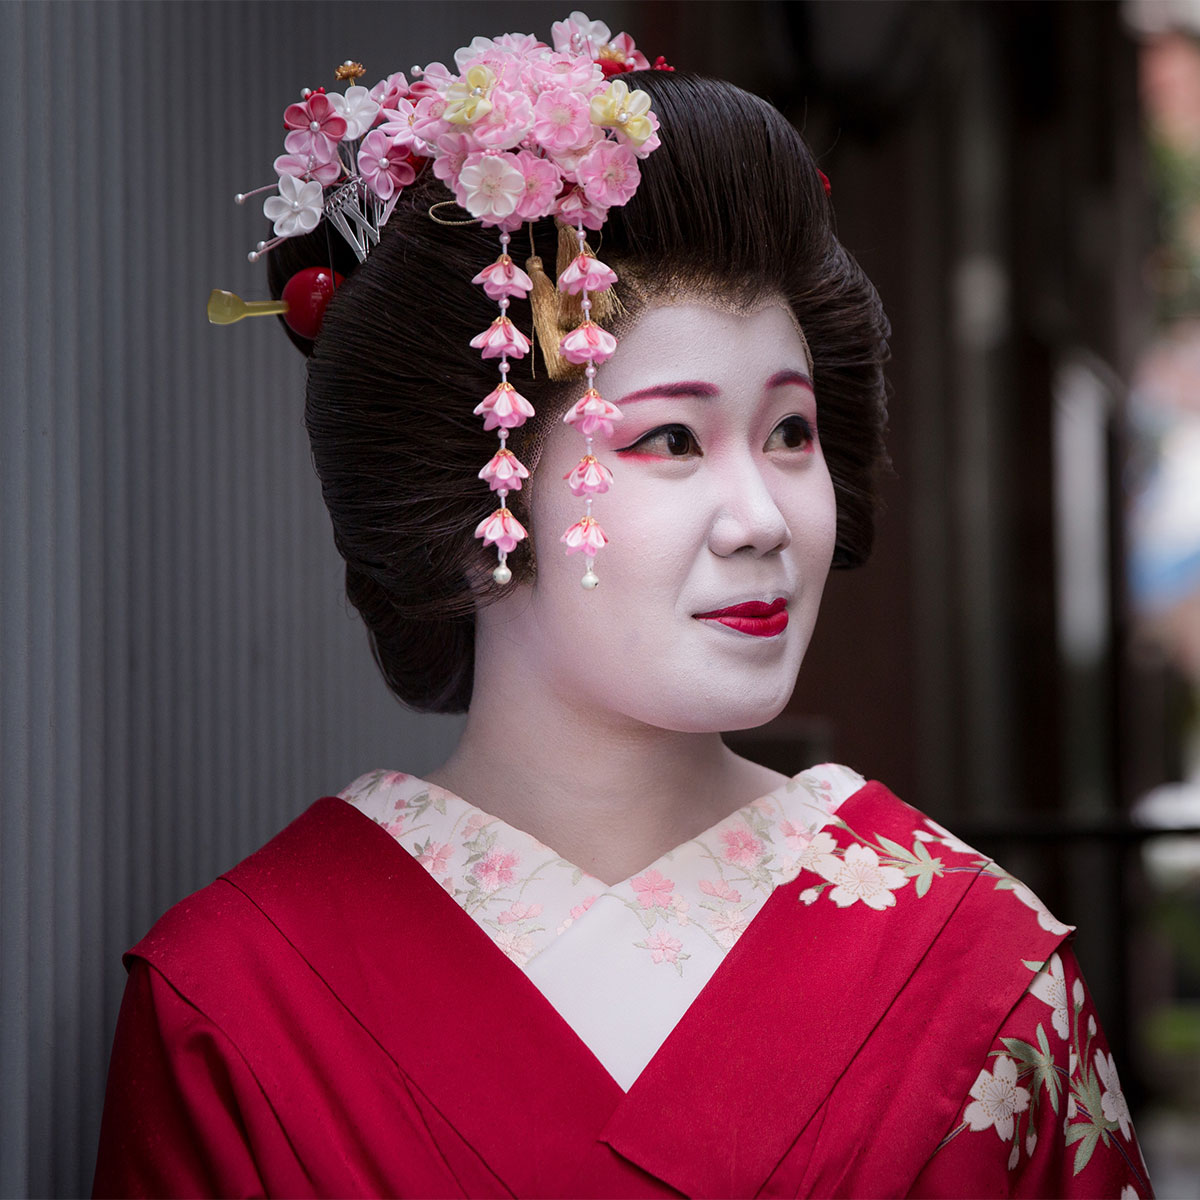 How to Book Geisha in Japan